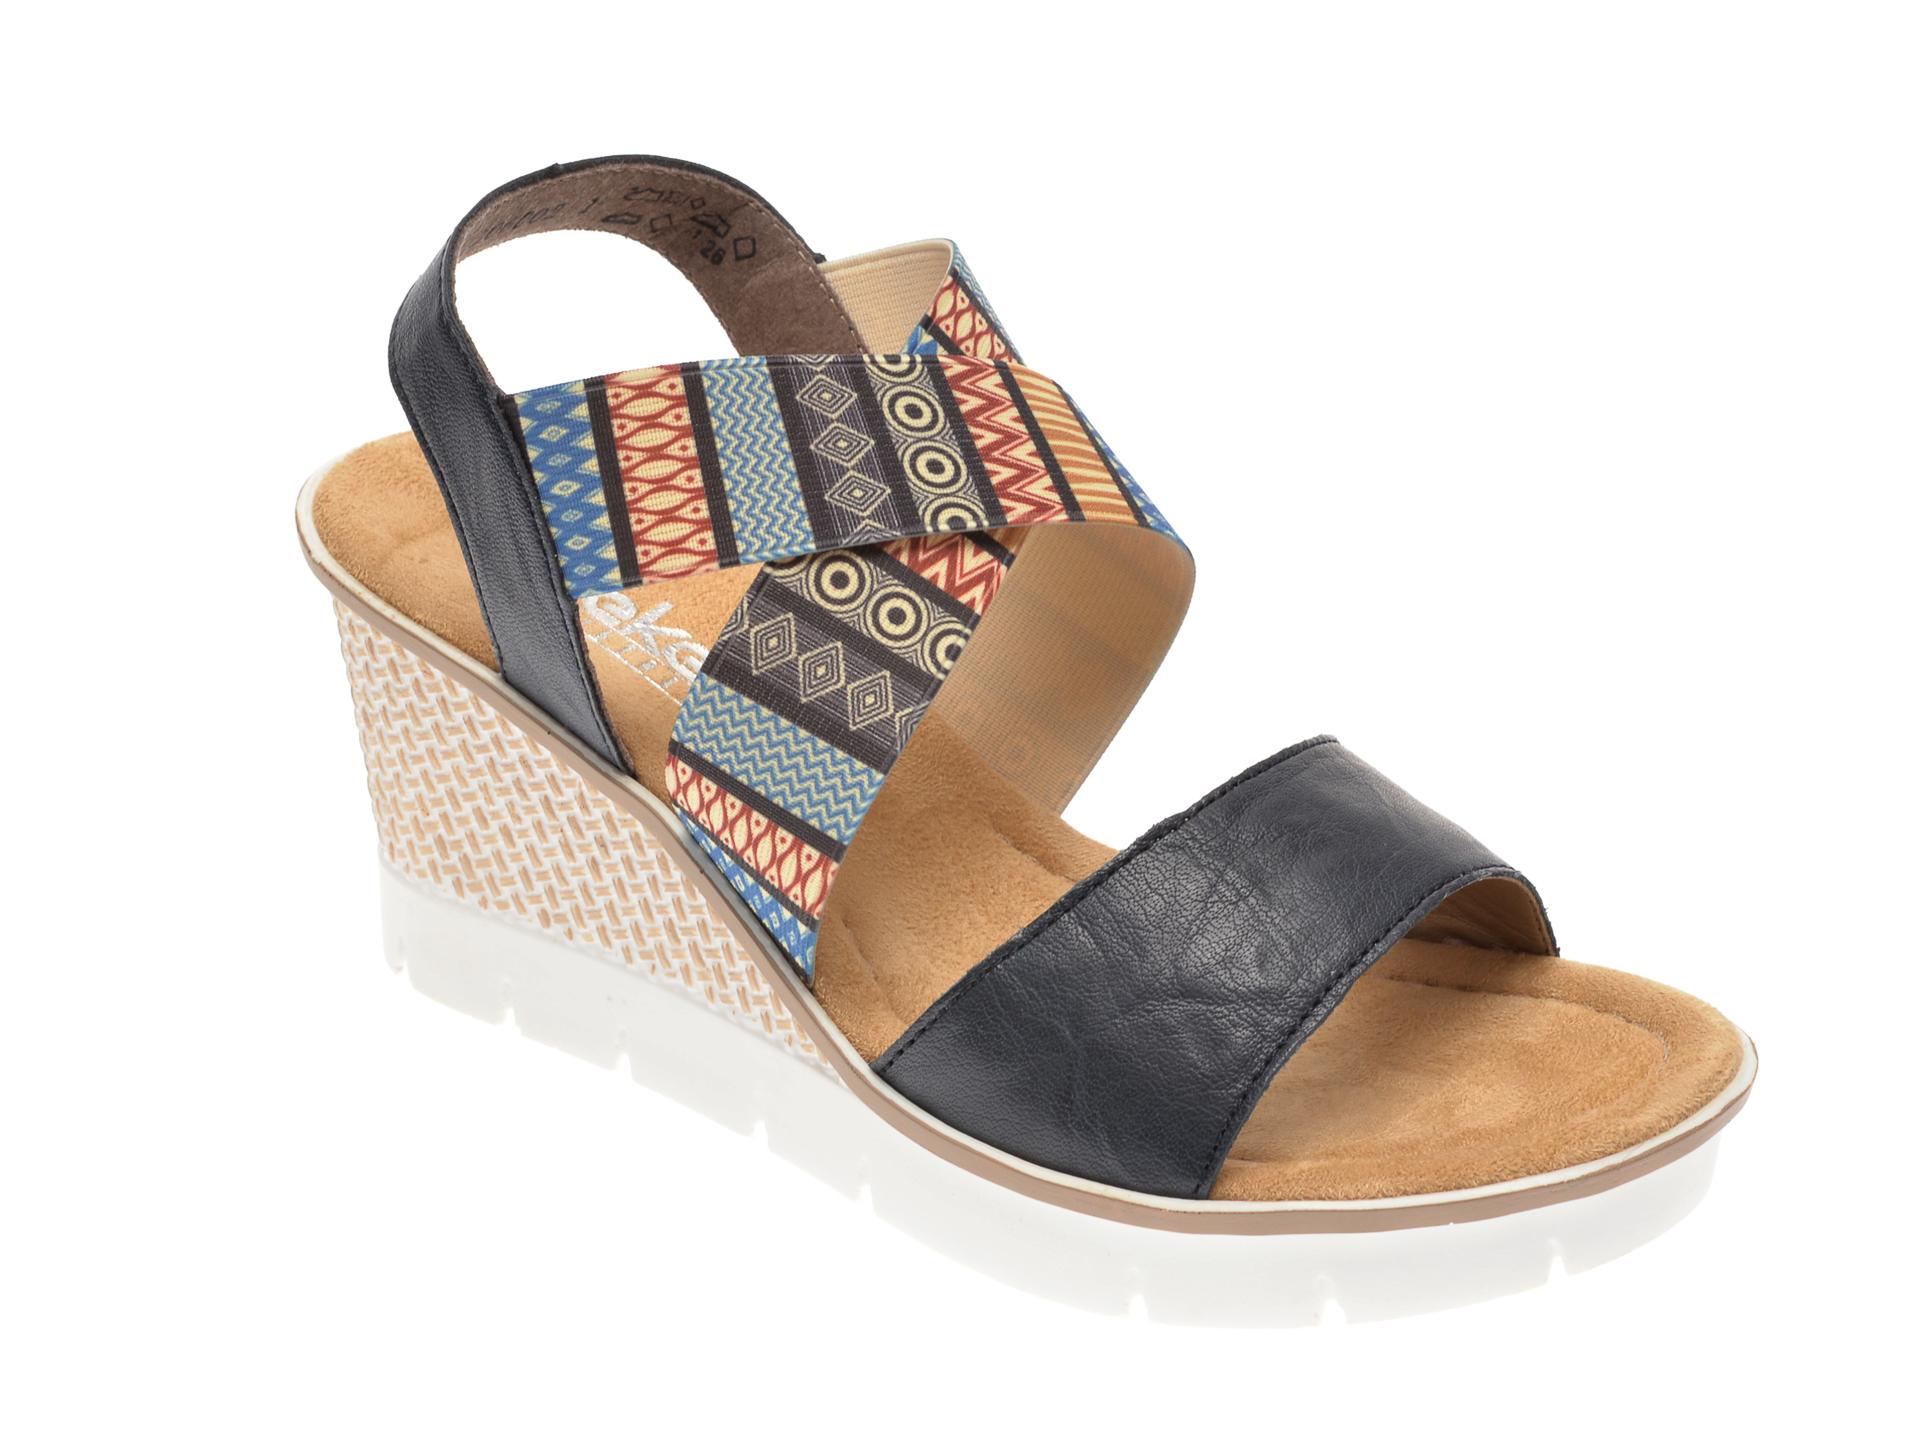 Sandale RIEKER bleumarin, 68518, din material textil si piele naturala